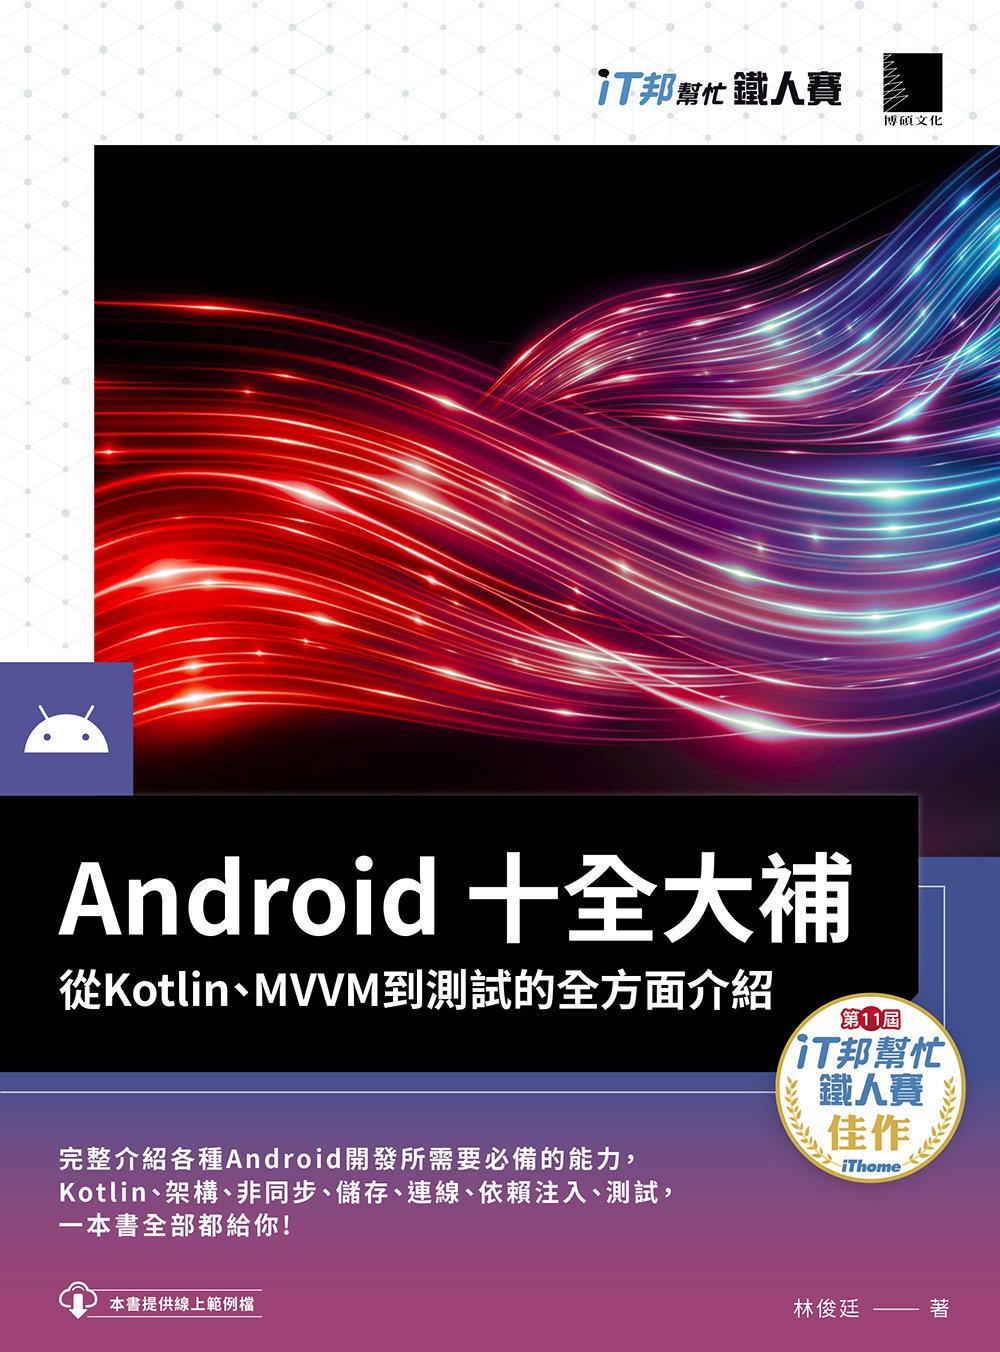 Android 十全大補:從 Kotlin、MVVM 到測試的全方面介紹(iT邦幫忙鐵人賽系列書)-preview-2